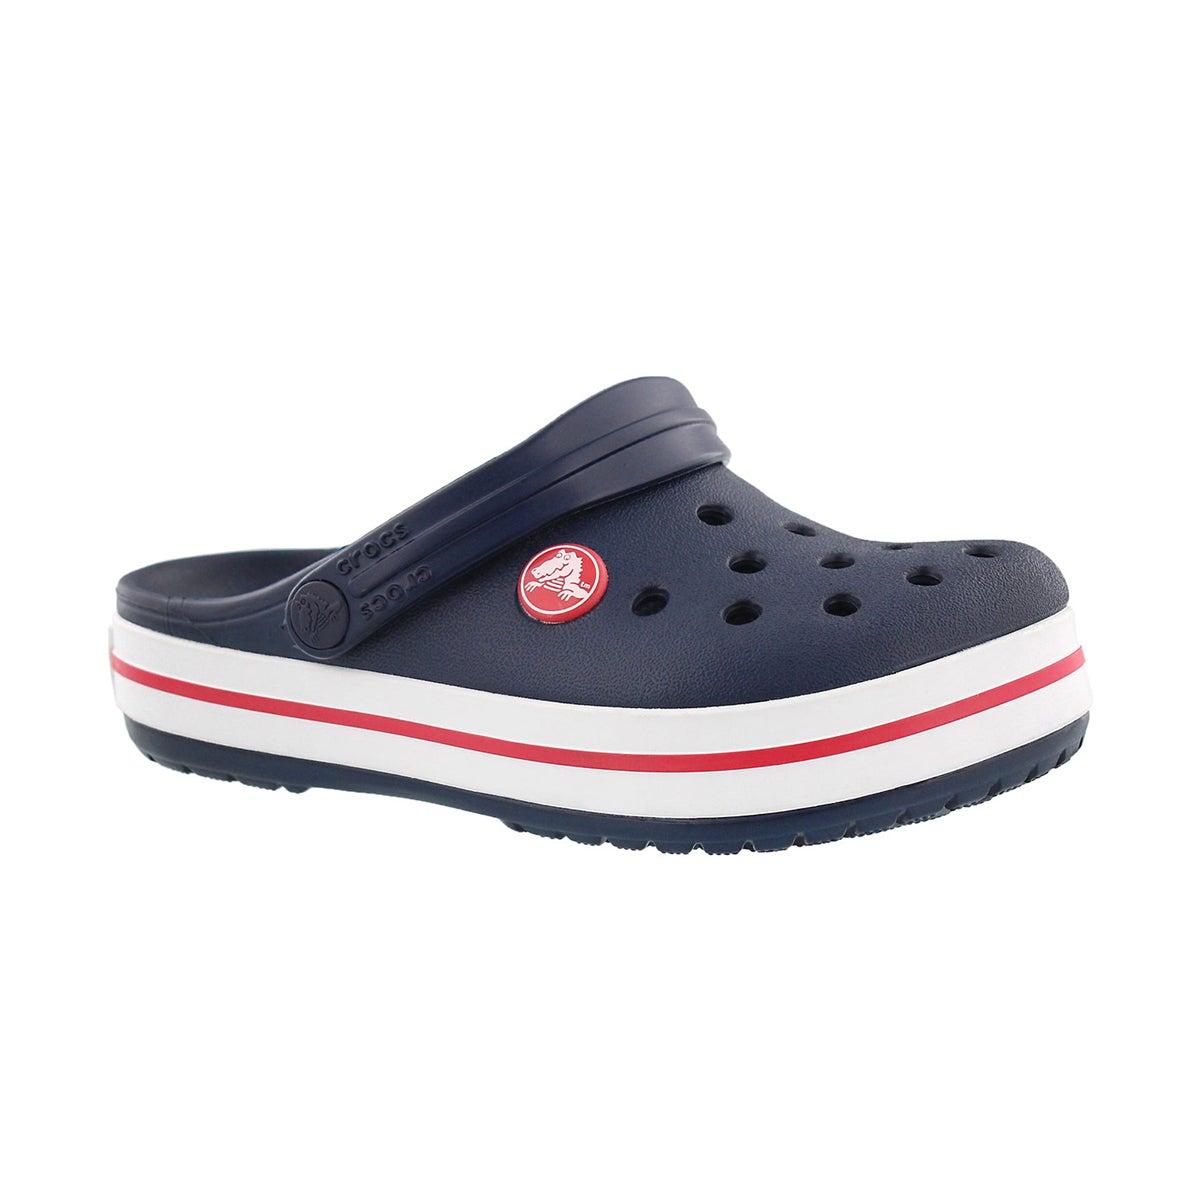 Kids' CROCBAND navy/red EVA comfort clogs